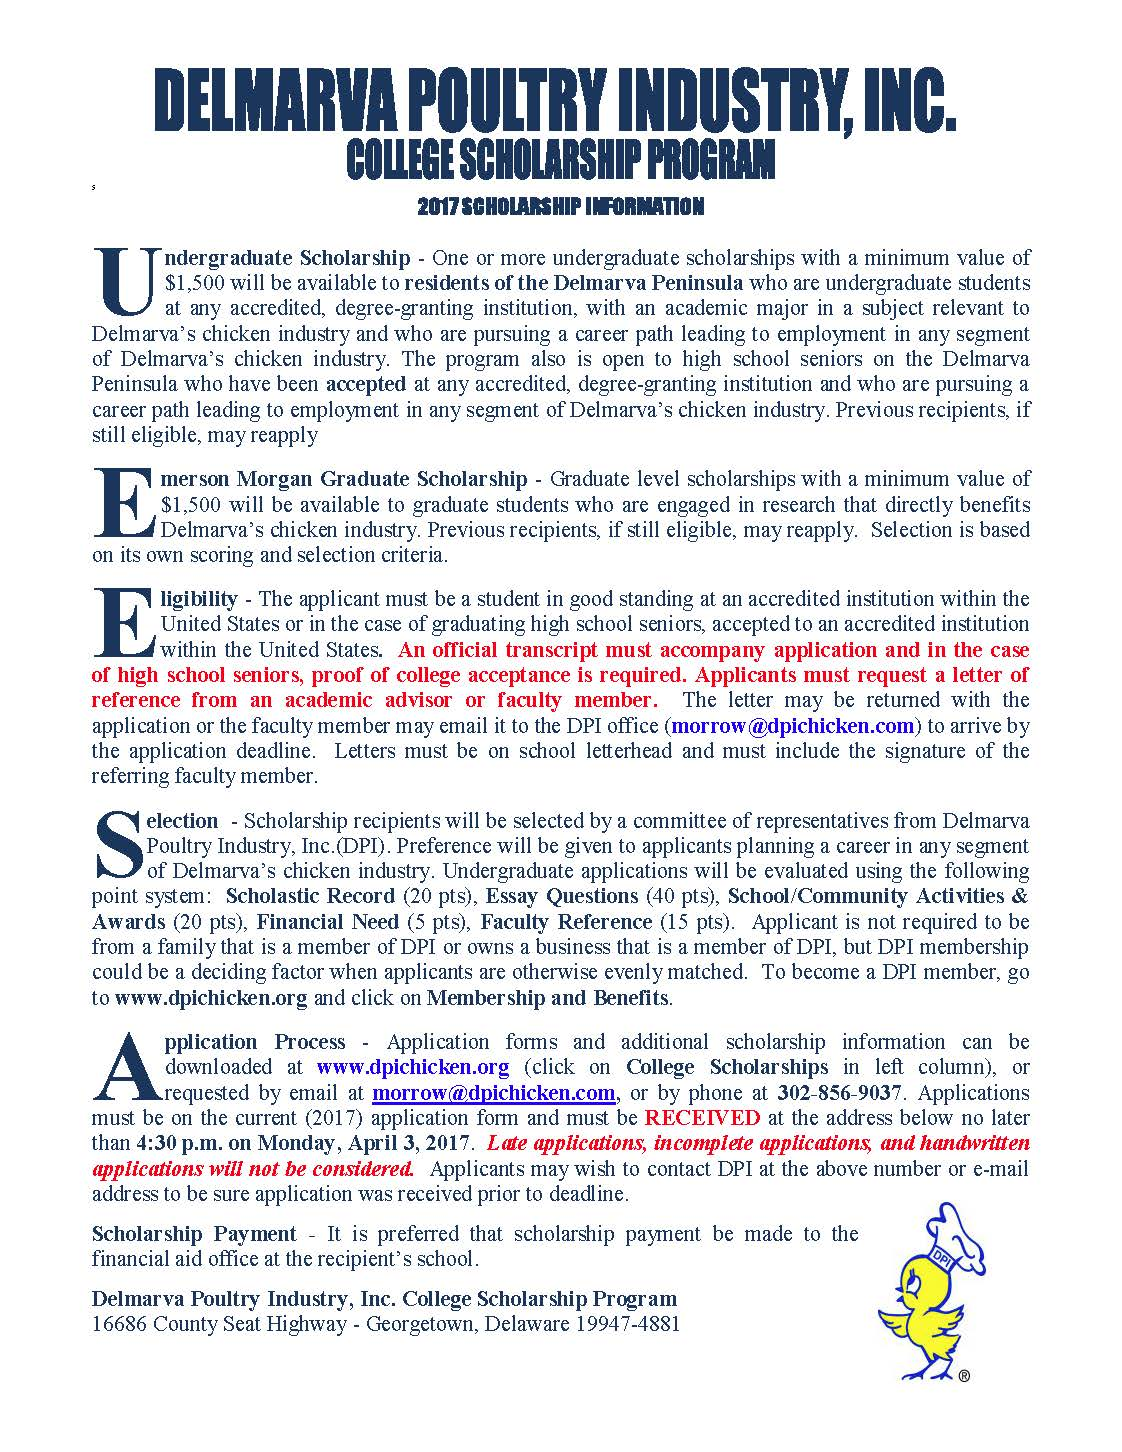 dpi-scholarship-info-color